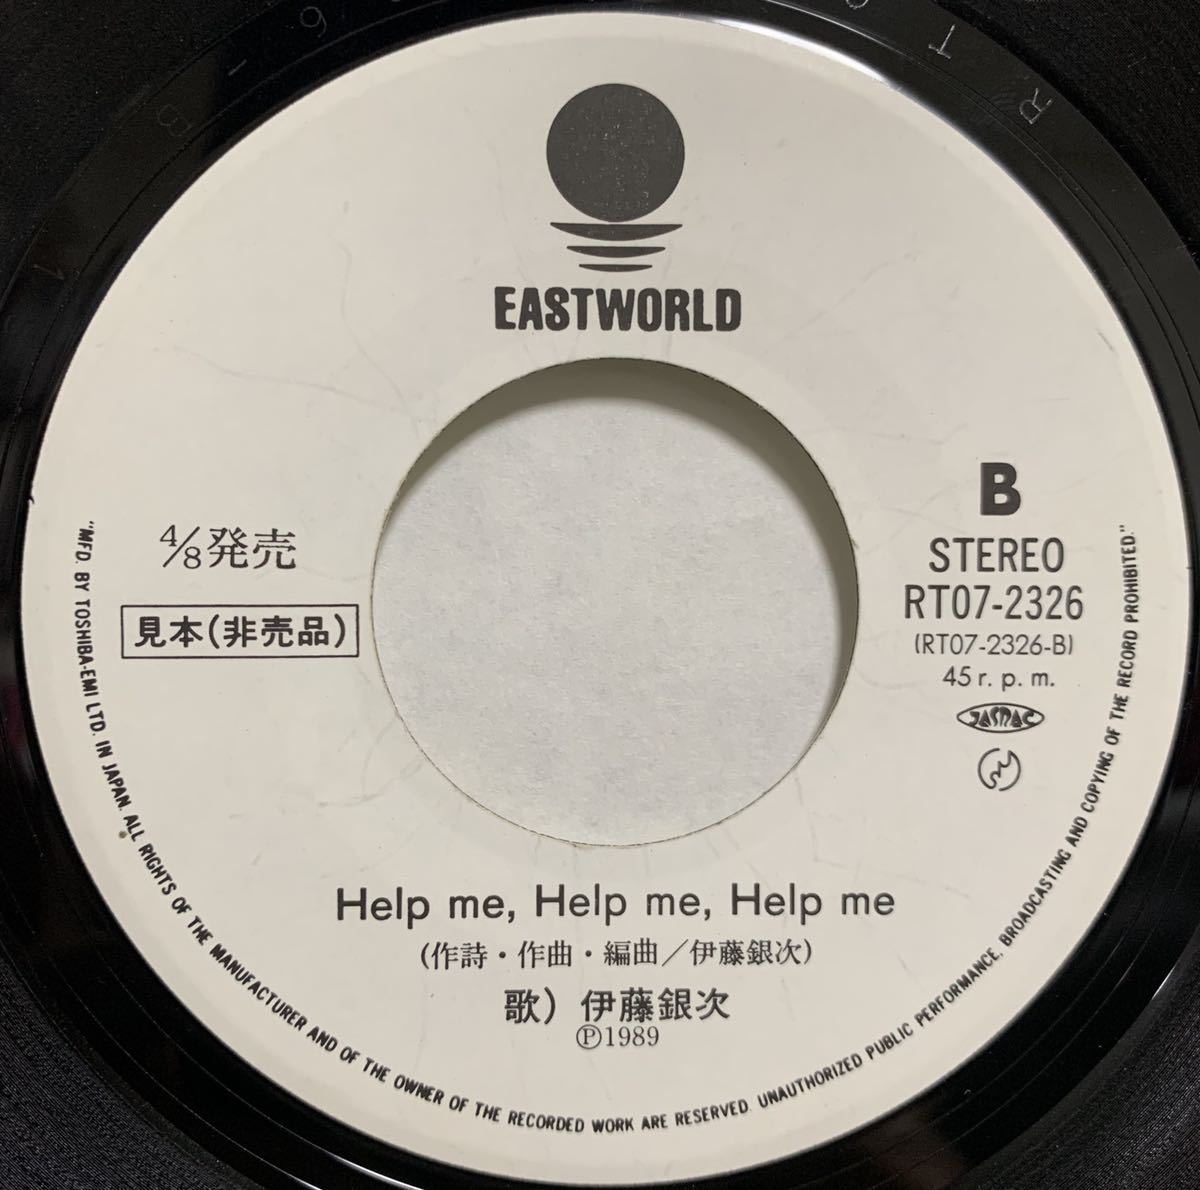 【EP】【7インチレコード】激レア 非売品 見本盤 伊藤銀次 / ロックスターの悲劇 / Help me,Help me,Help me 和モノ 極上 シティポップ_画像4